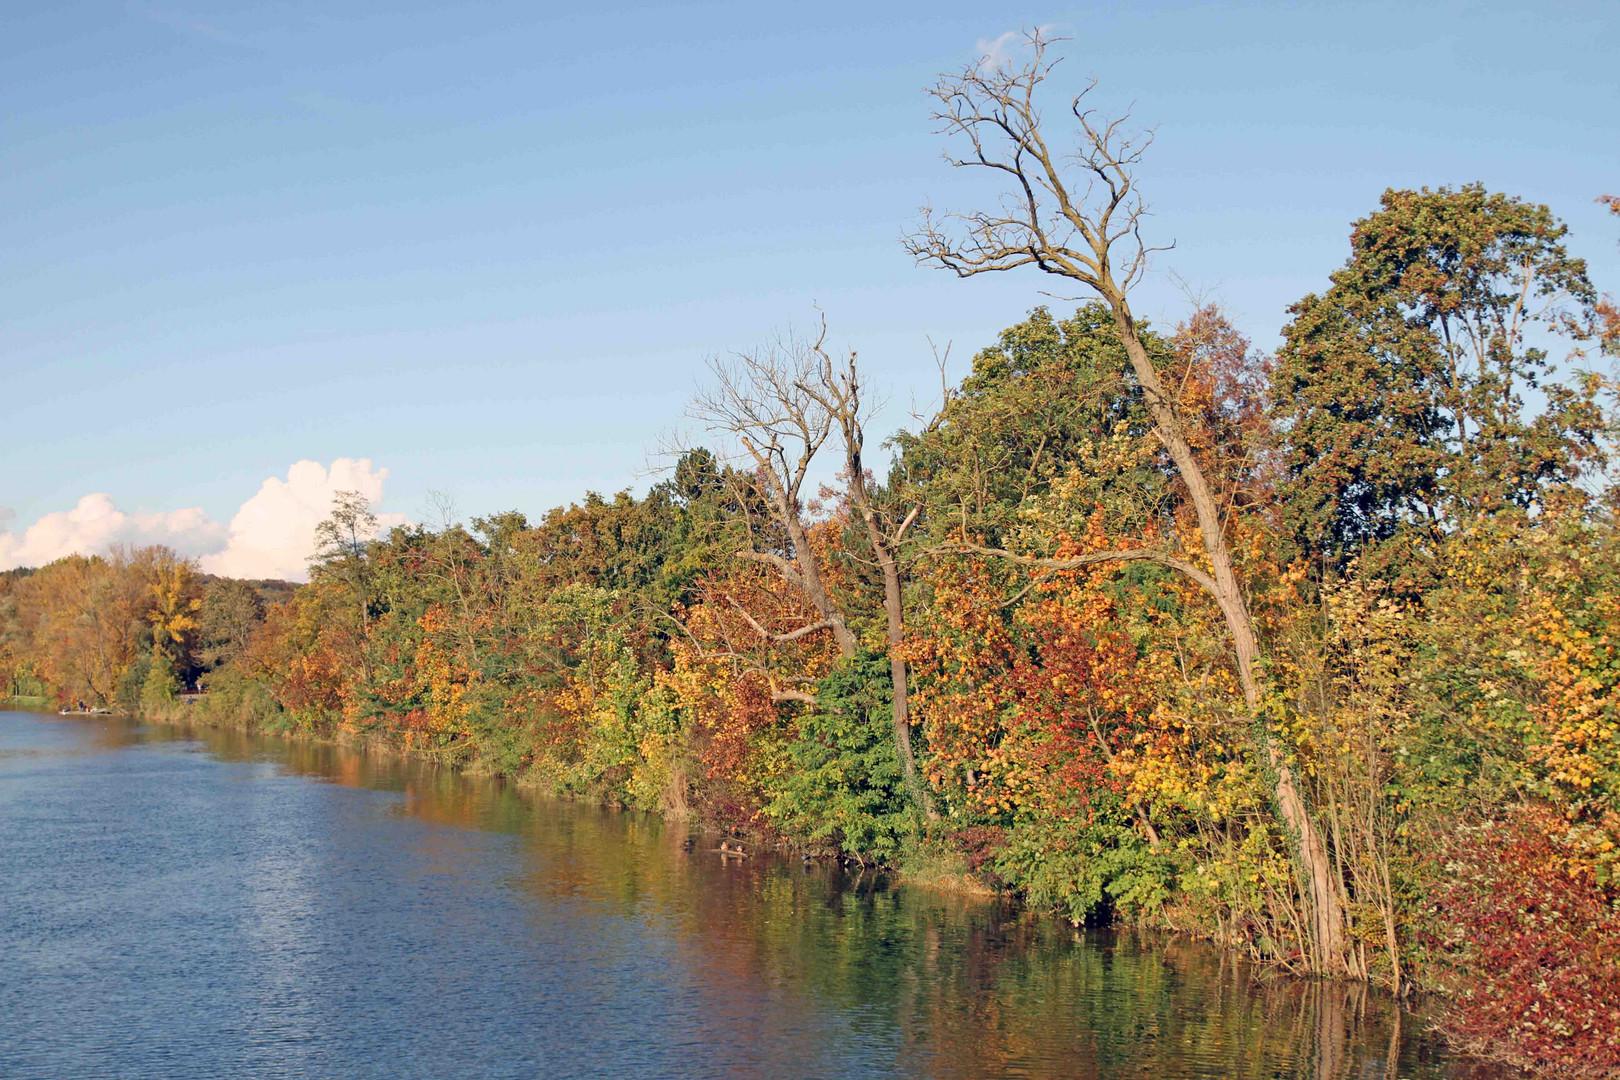 Idylische Herbstimmung am Ulmer Donauufer entlang 2